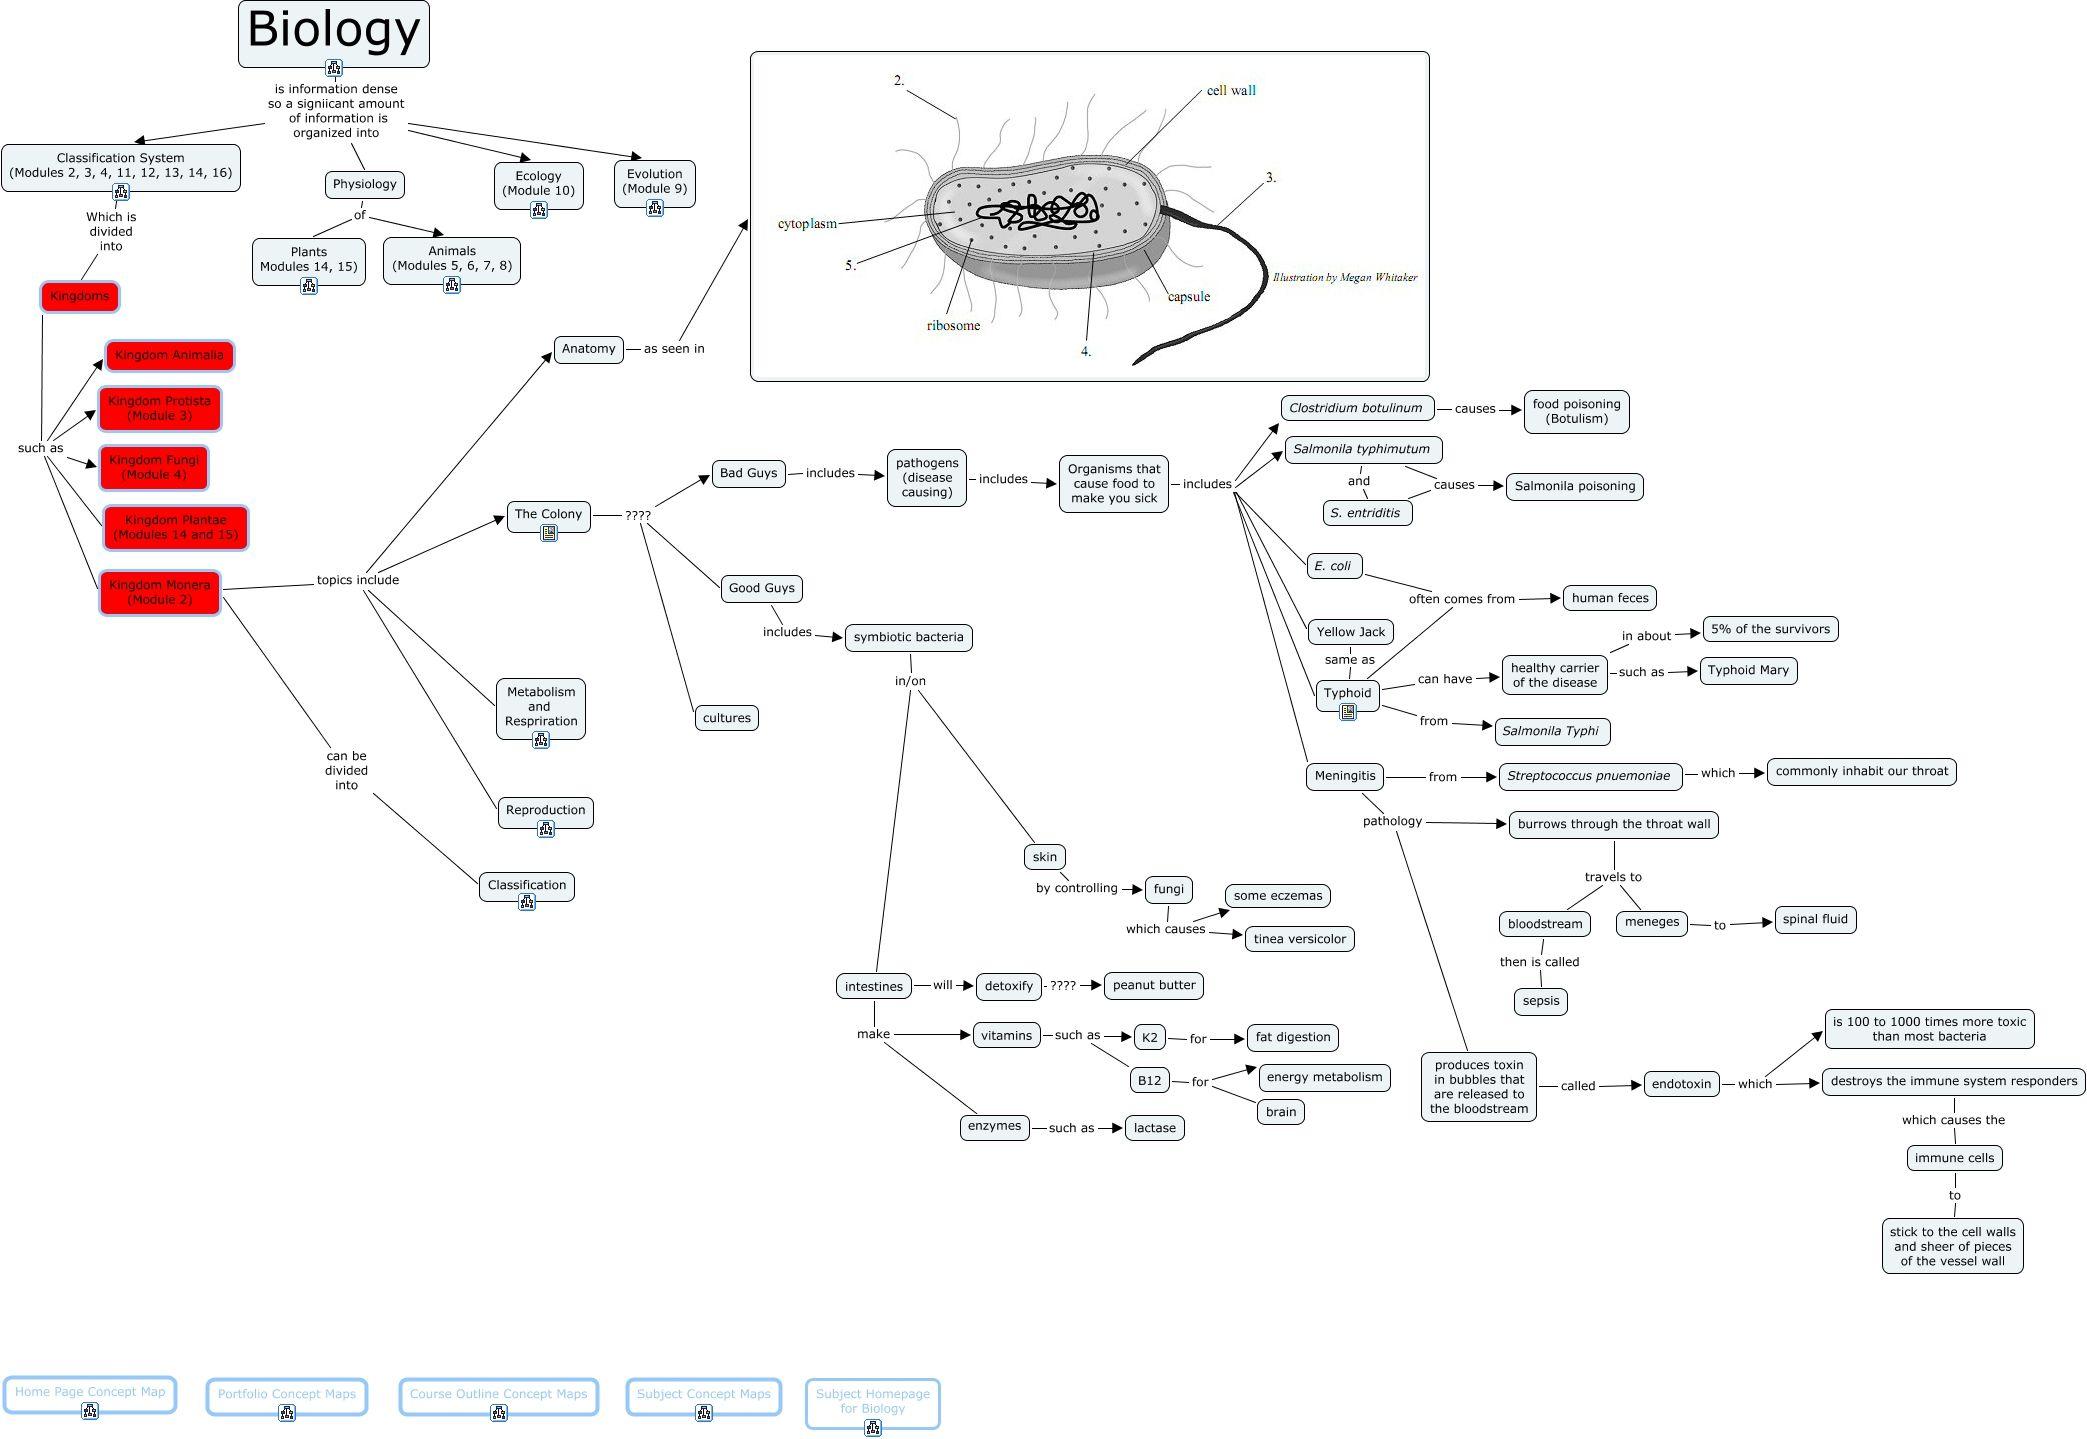 Kingdom Monera Biology Lessons Plant Identification Concept Map [ 1439 x 2087 Pixel ]